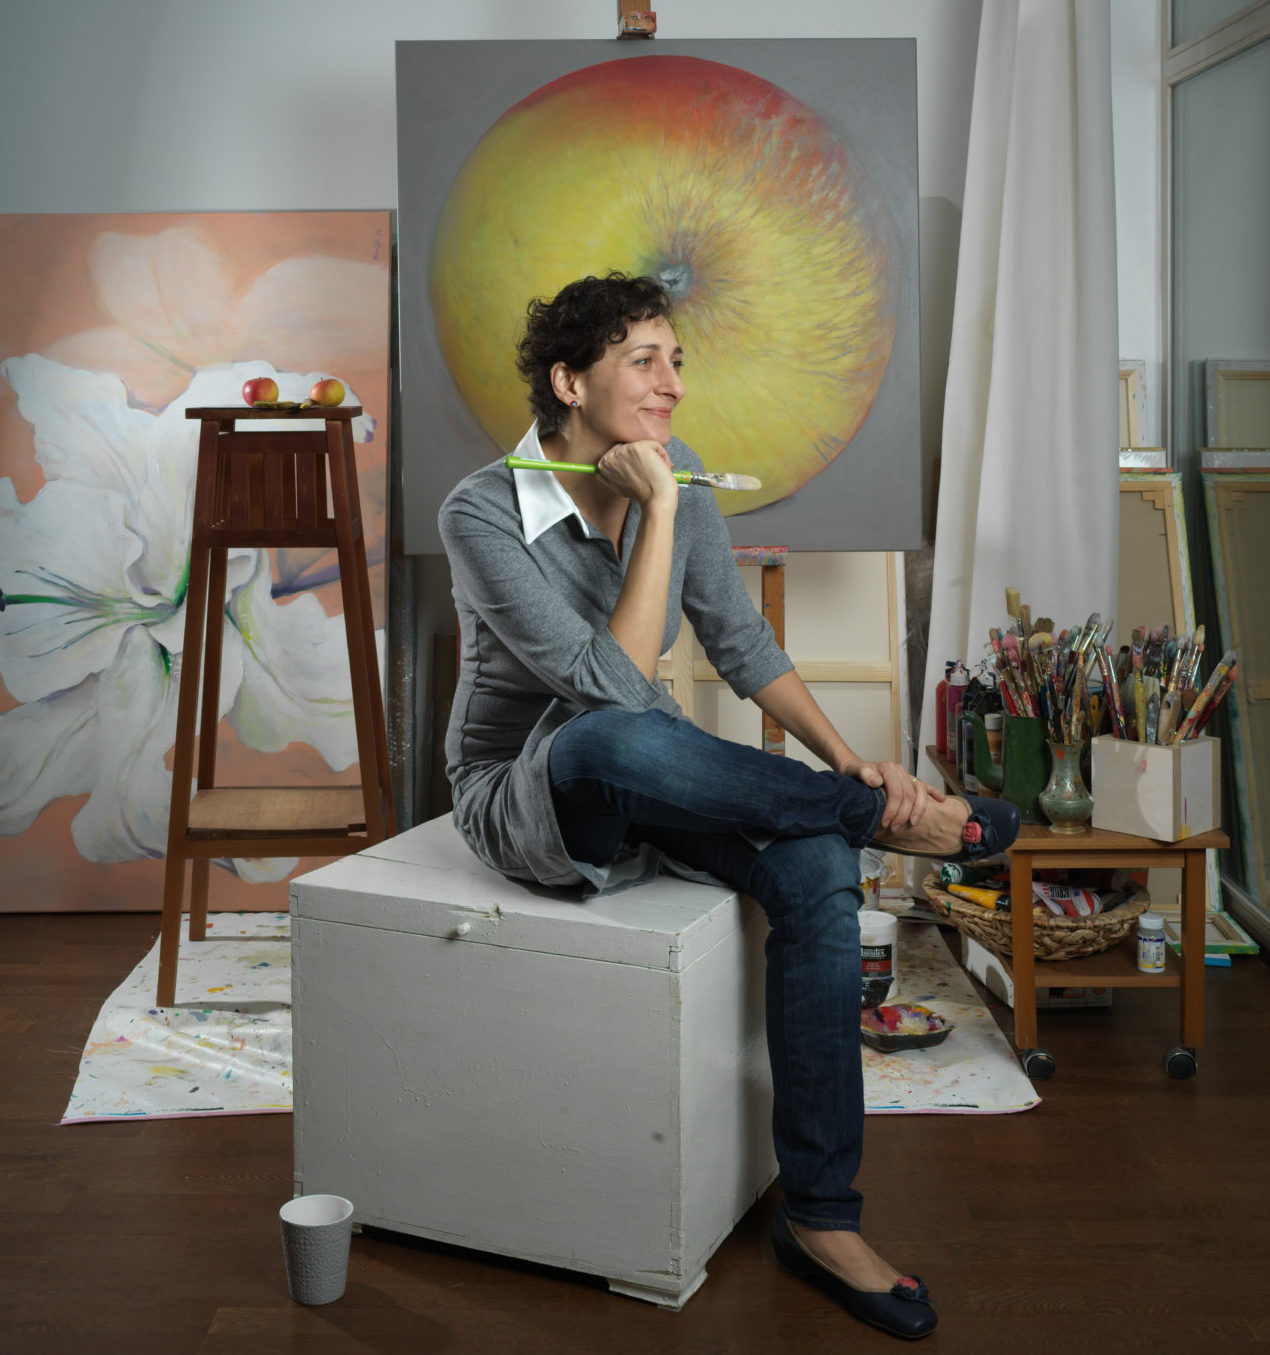 Kamille Ateljee Life in Estonia